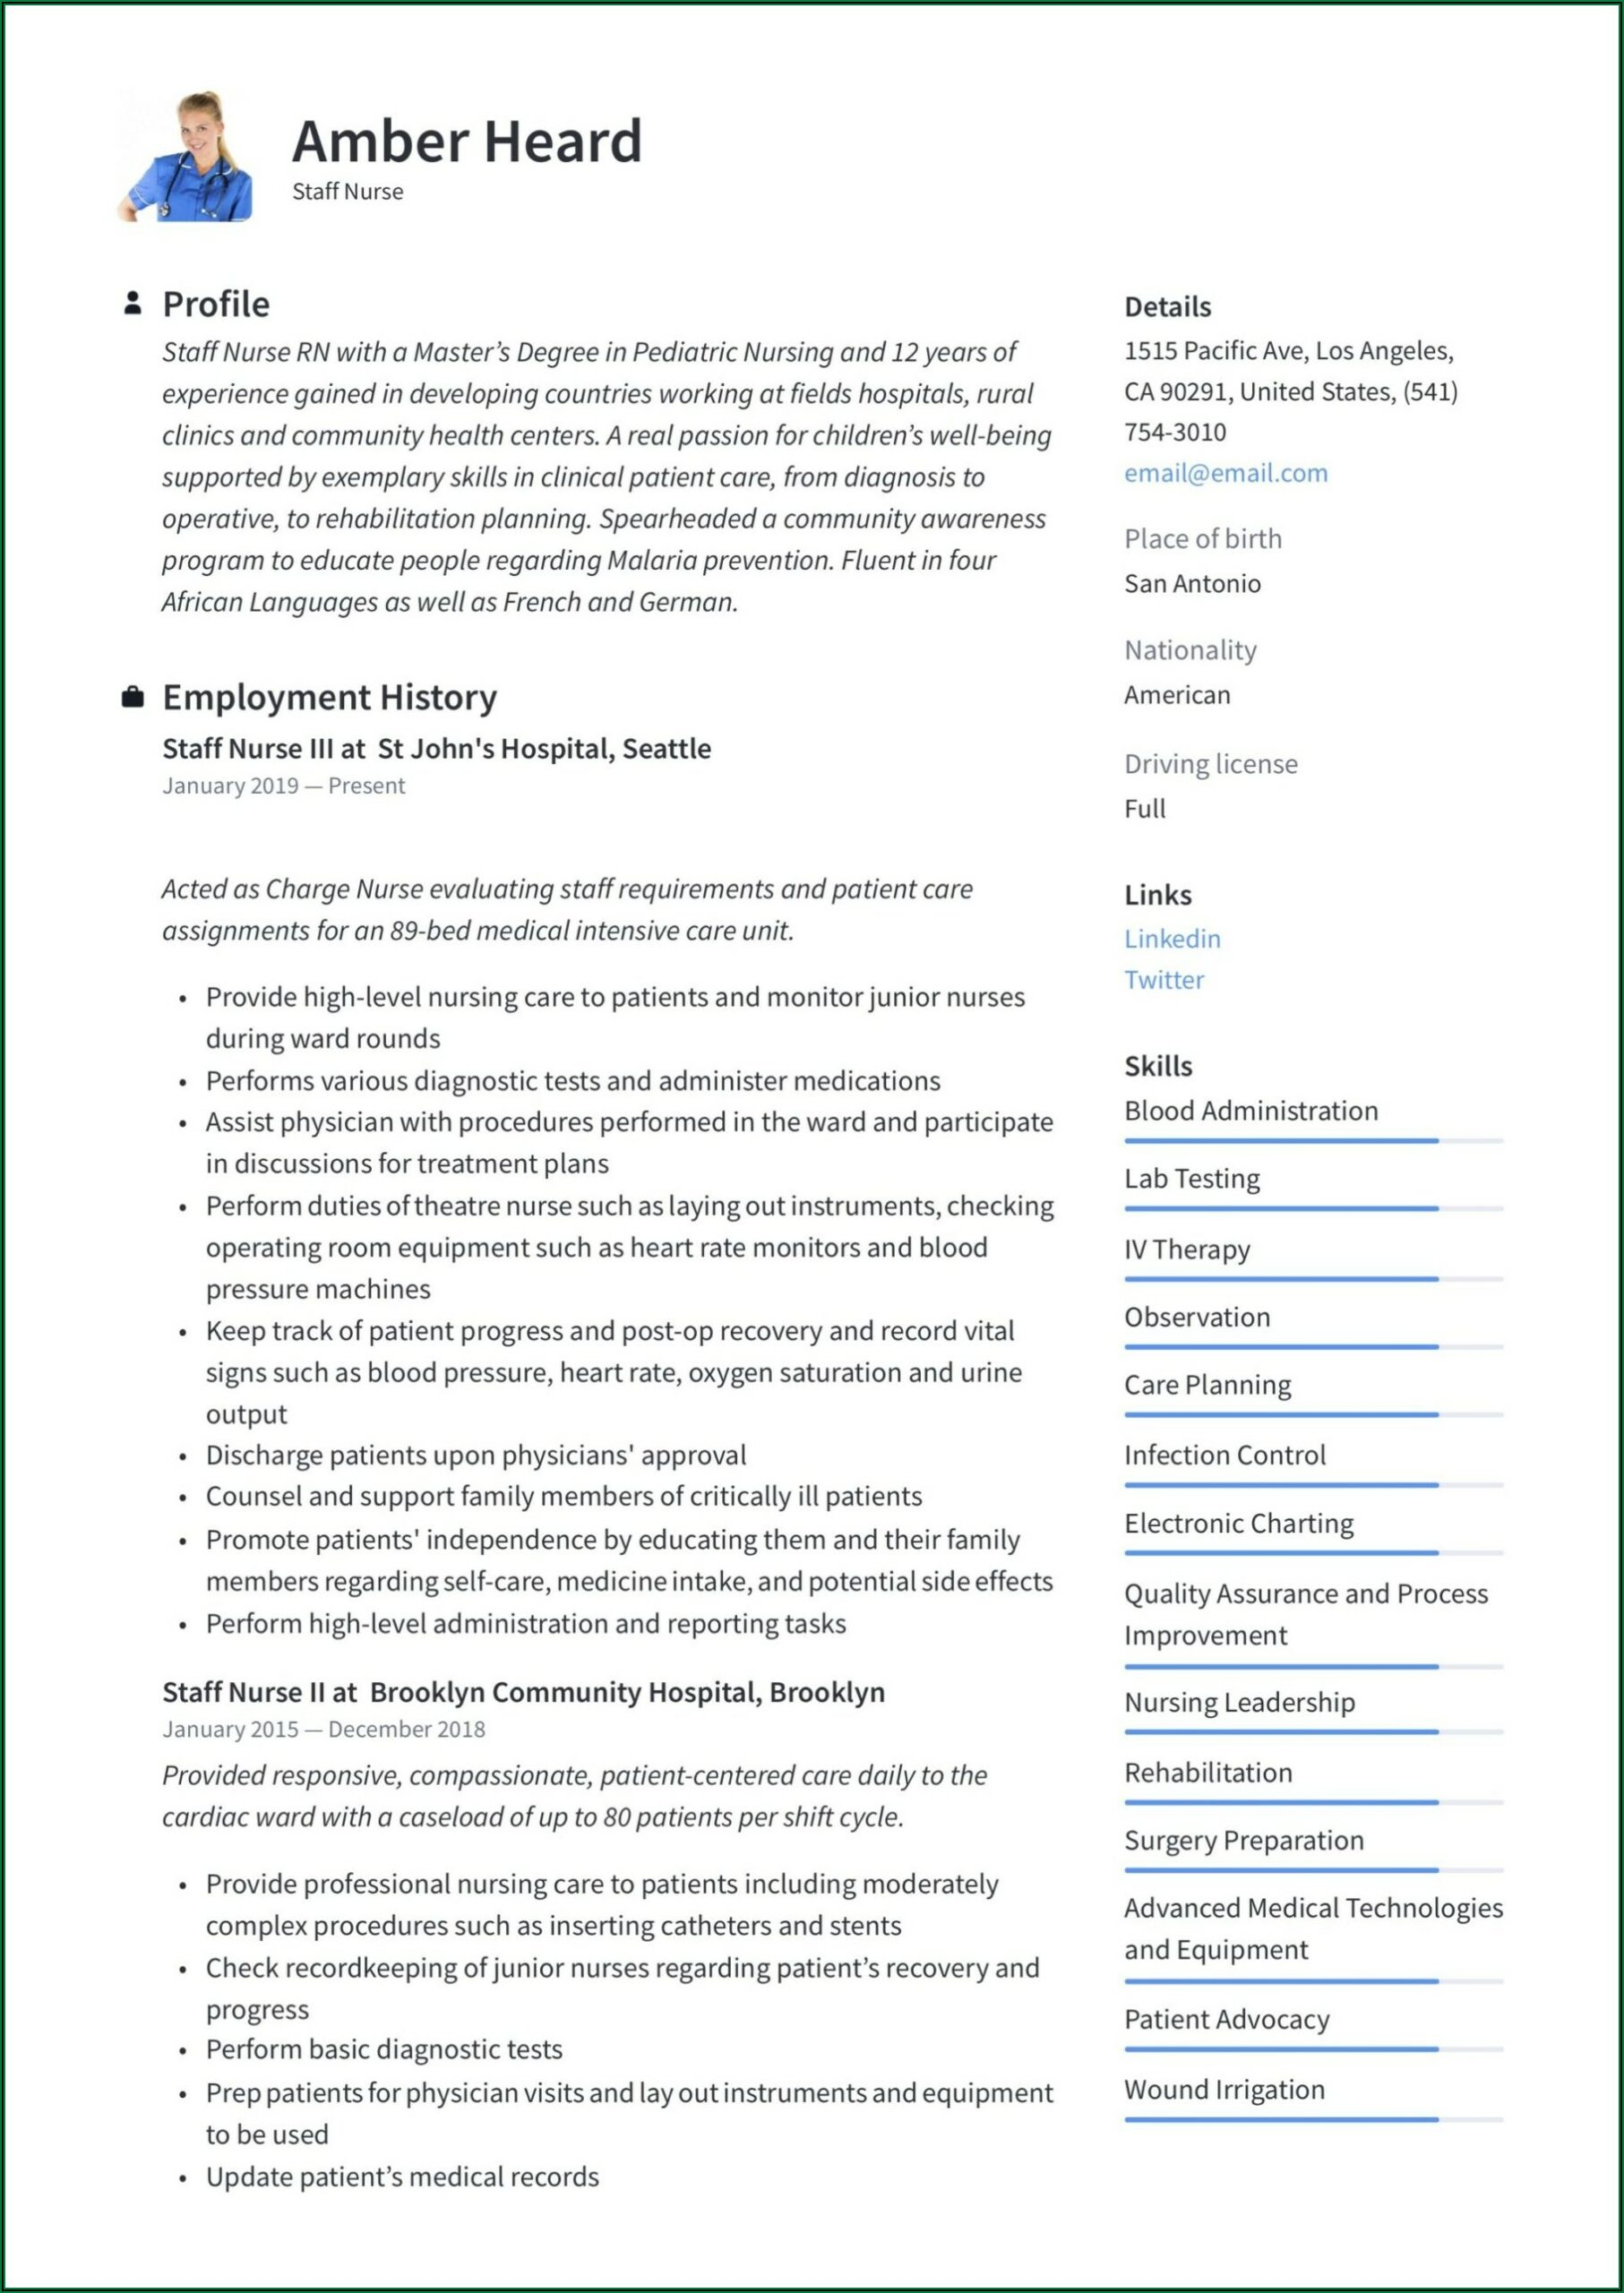 Sample Staff Nurse Resume Free Download